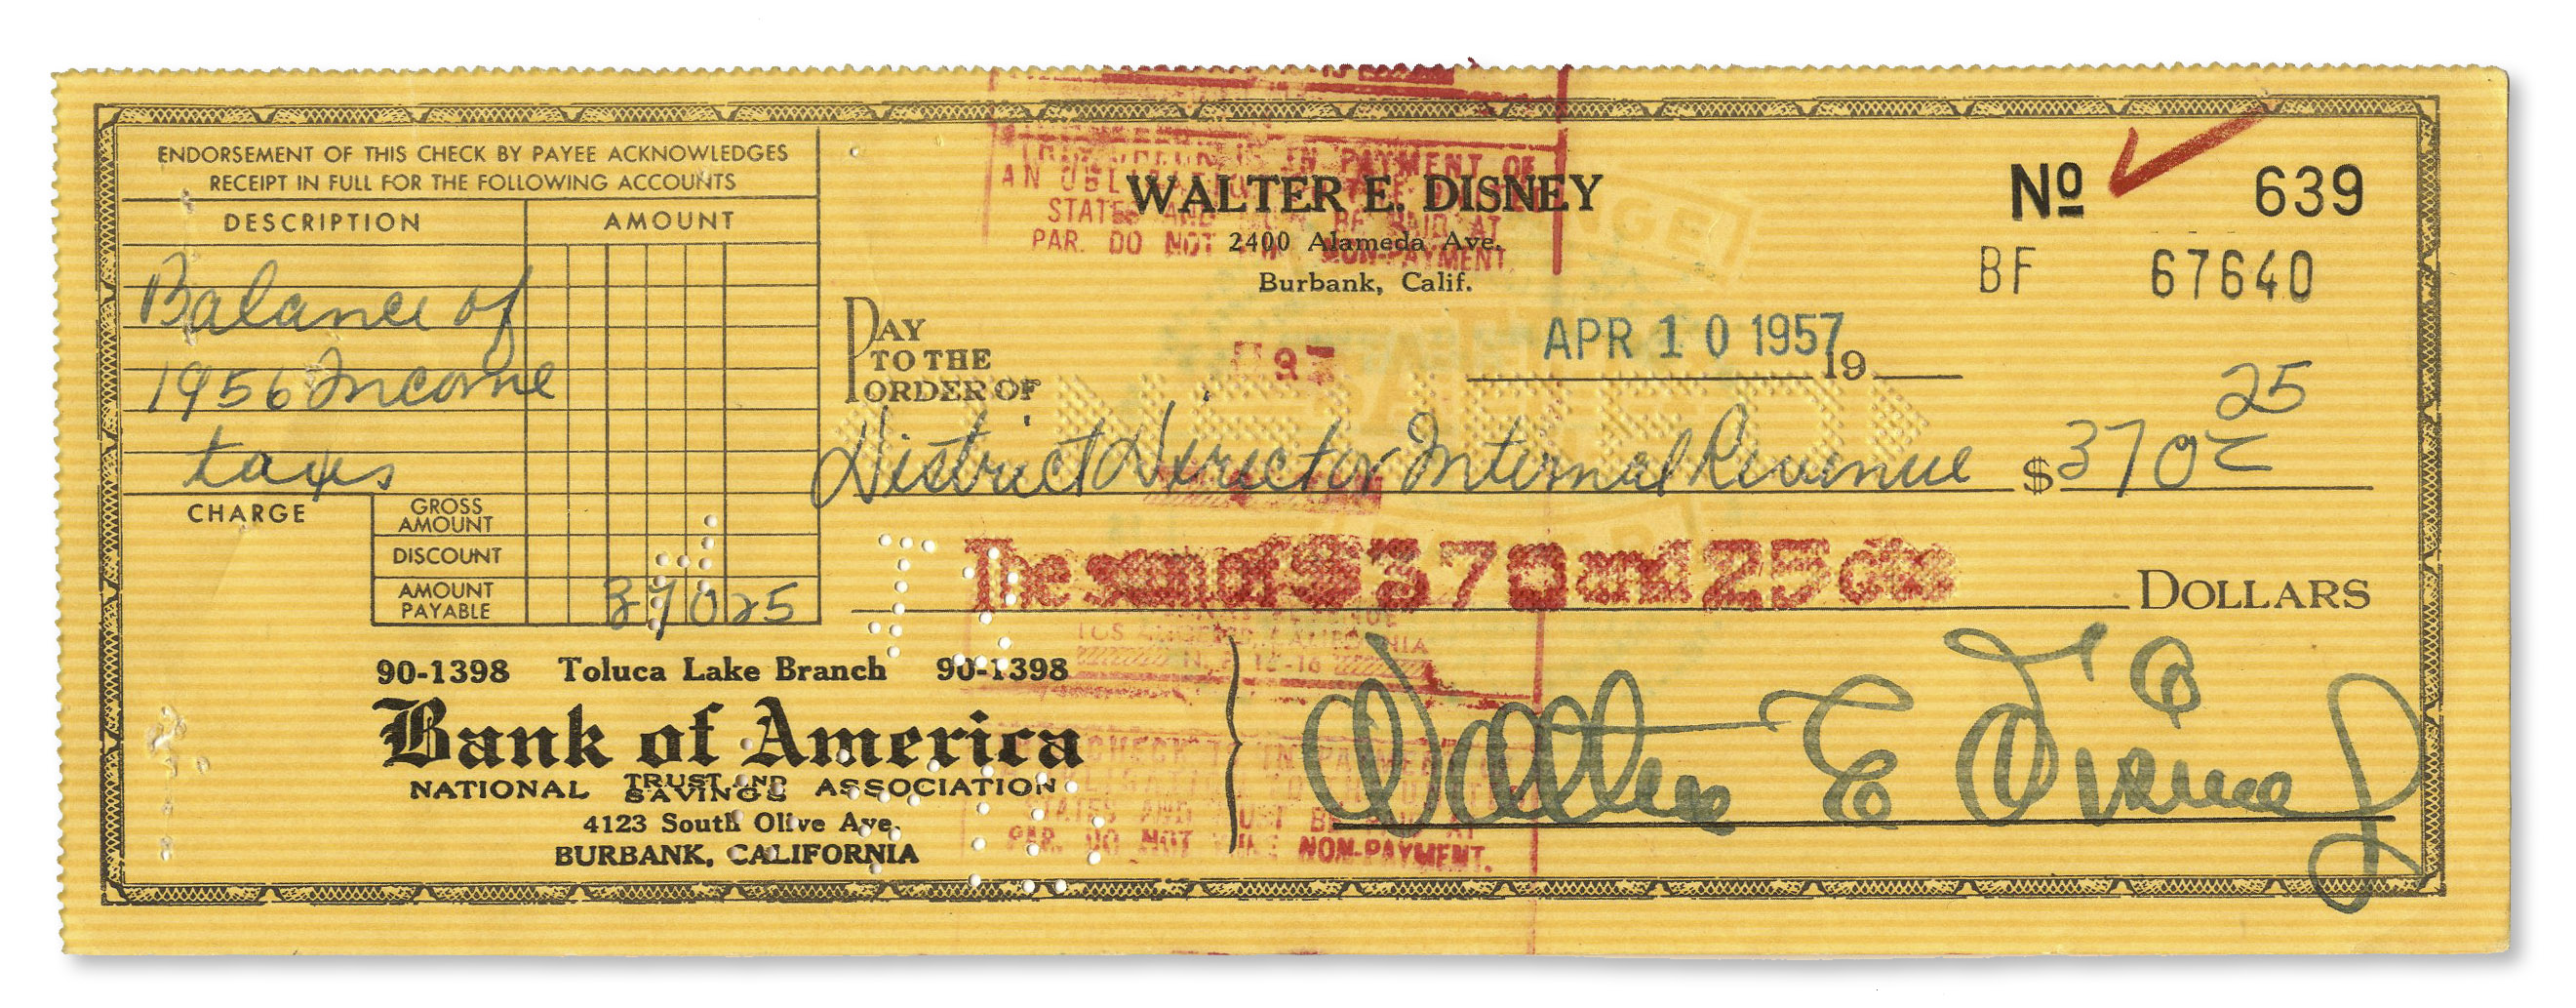 Free appraisal for your walt disney autograph we sold at 17500 walt disney autograph walt disney signed check signed walter e disney 1betcityfo Choice Image